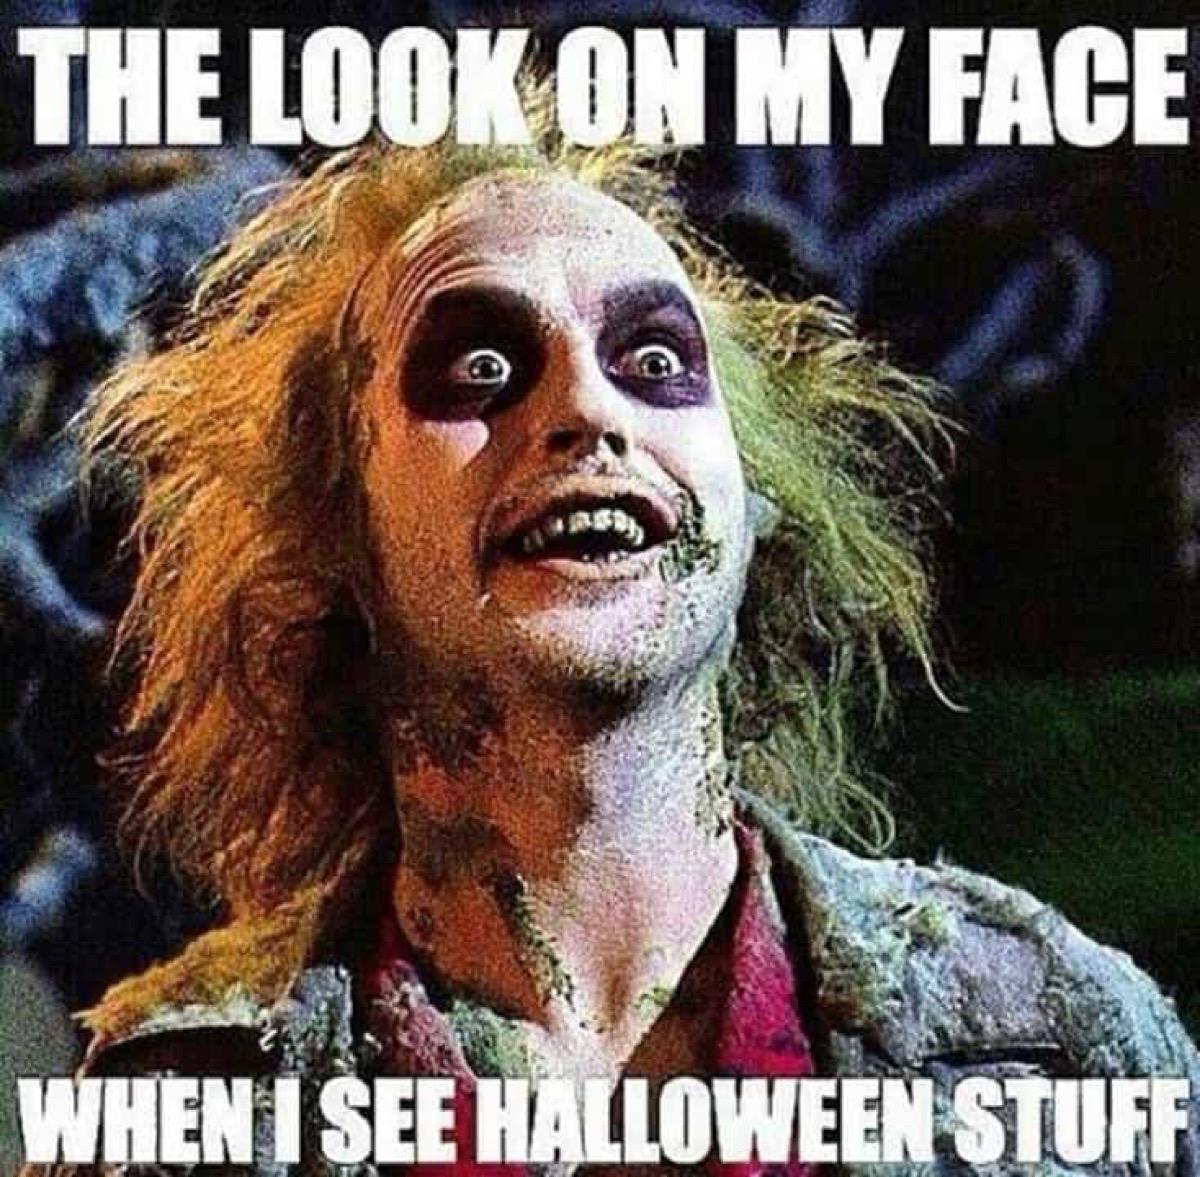 beetlejuice face, halloween memes